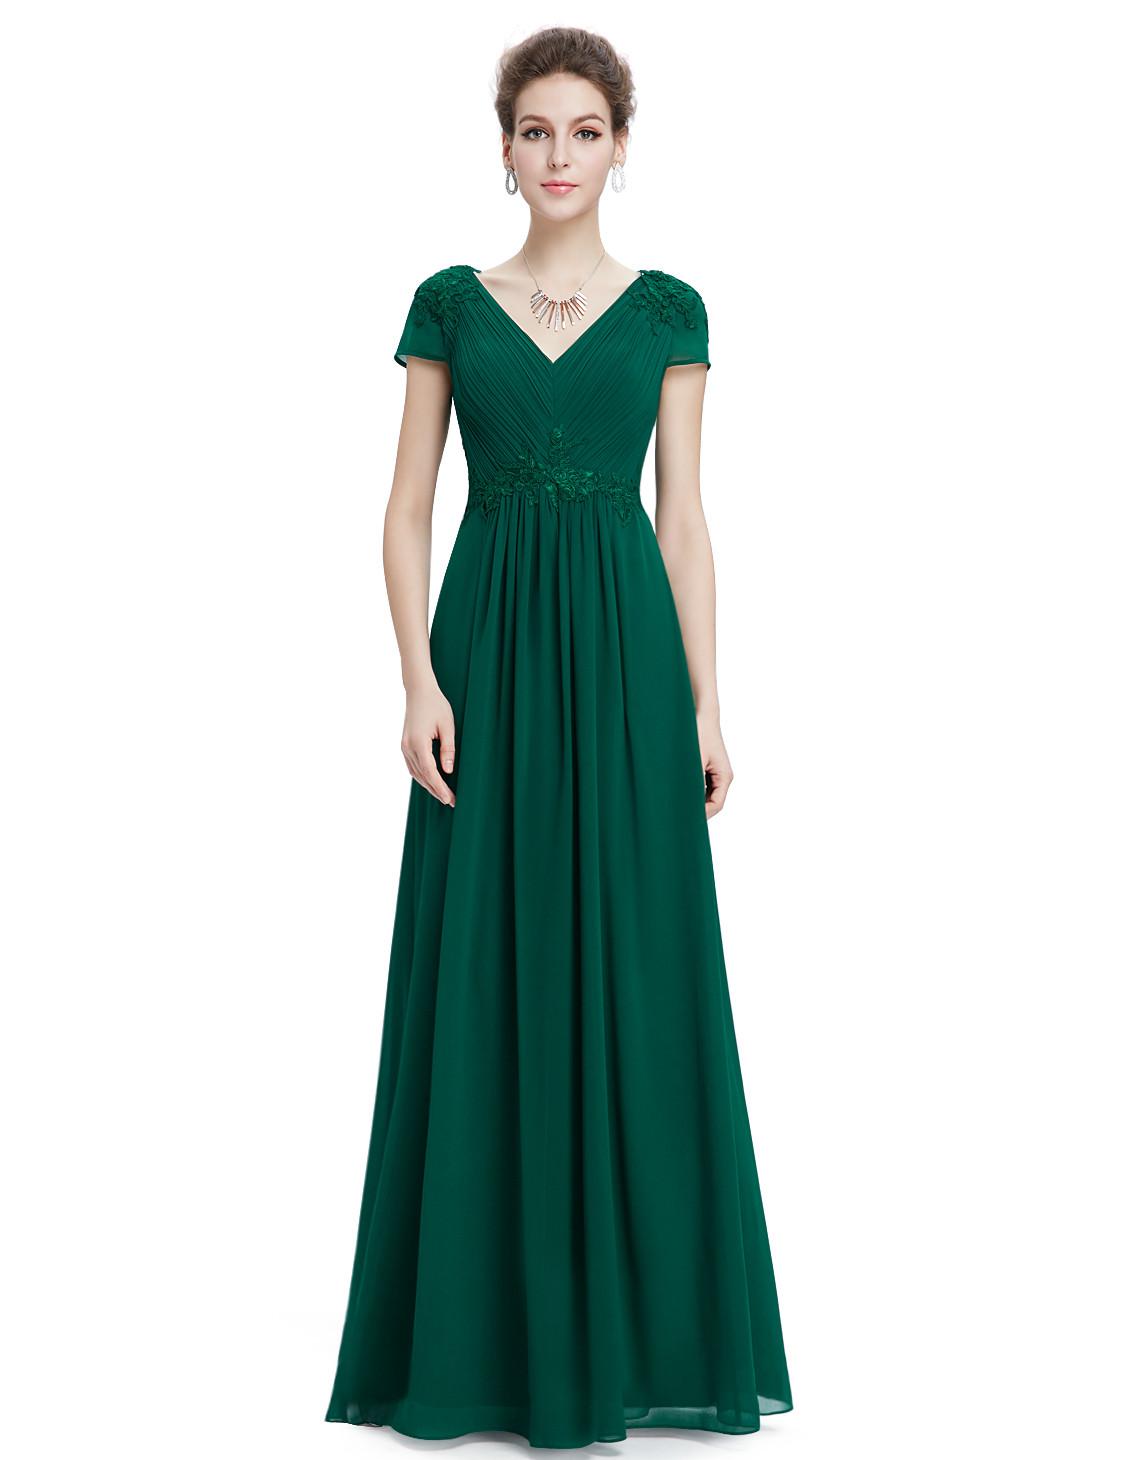 V-neck Ruched Deep Geen Bridesmaid Dress